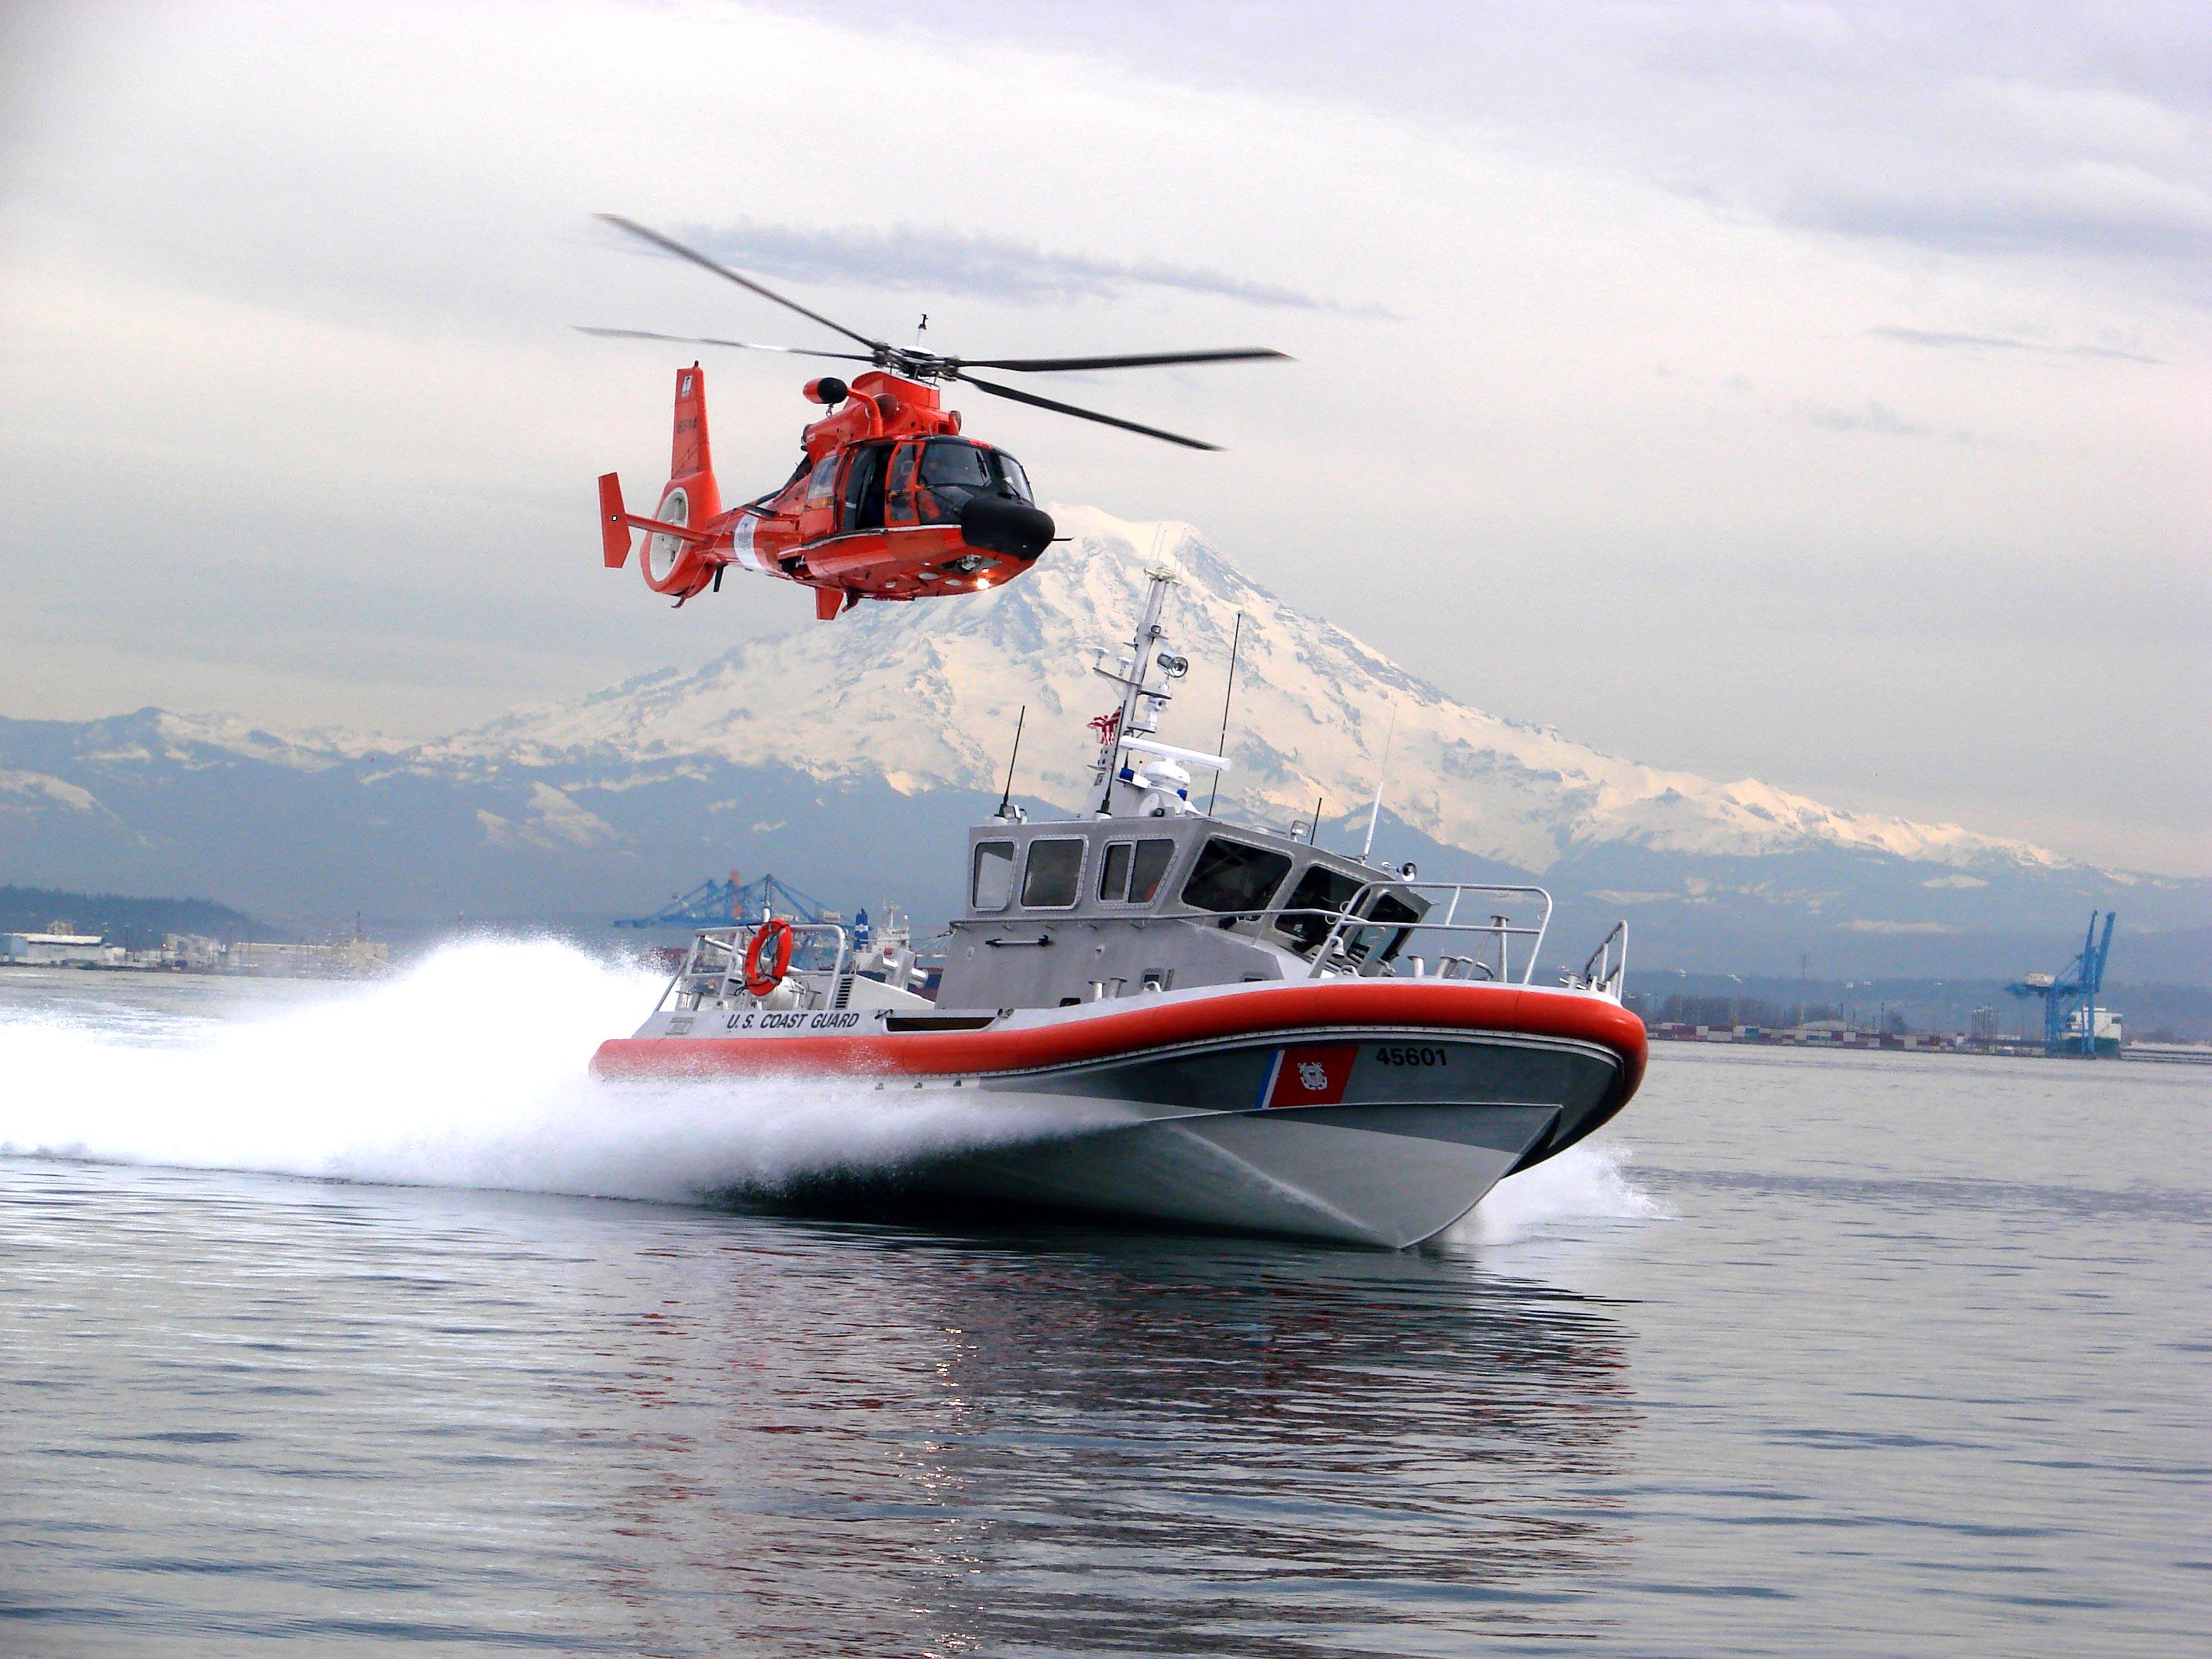 Uscg boat and chopper5